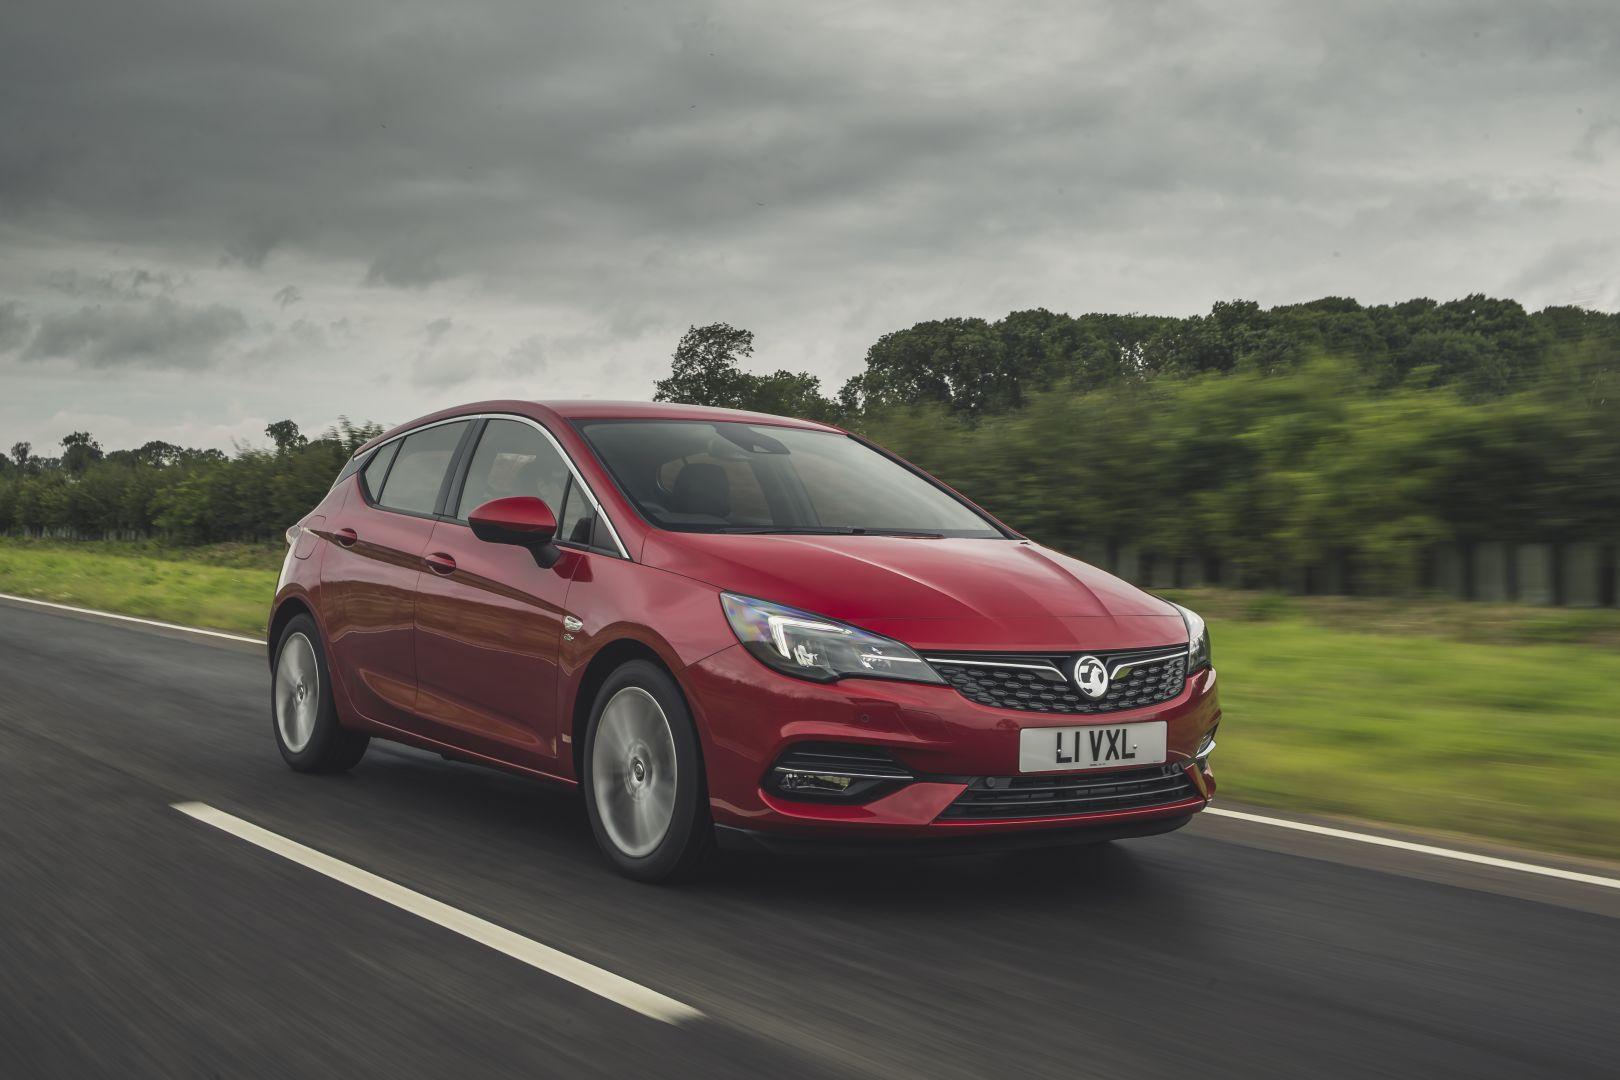 Vauxhall Astra Hatchback Specs Photos 2019 2020 2021 Autoevolution